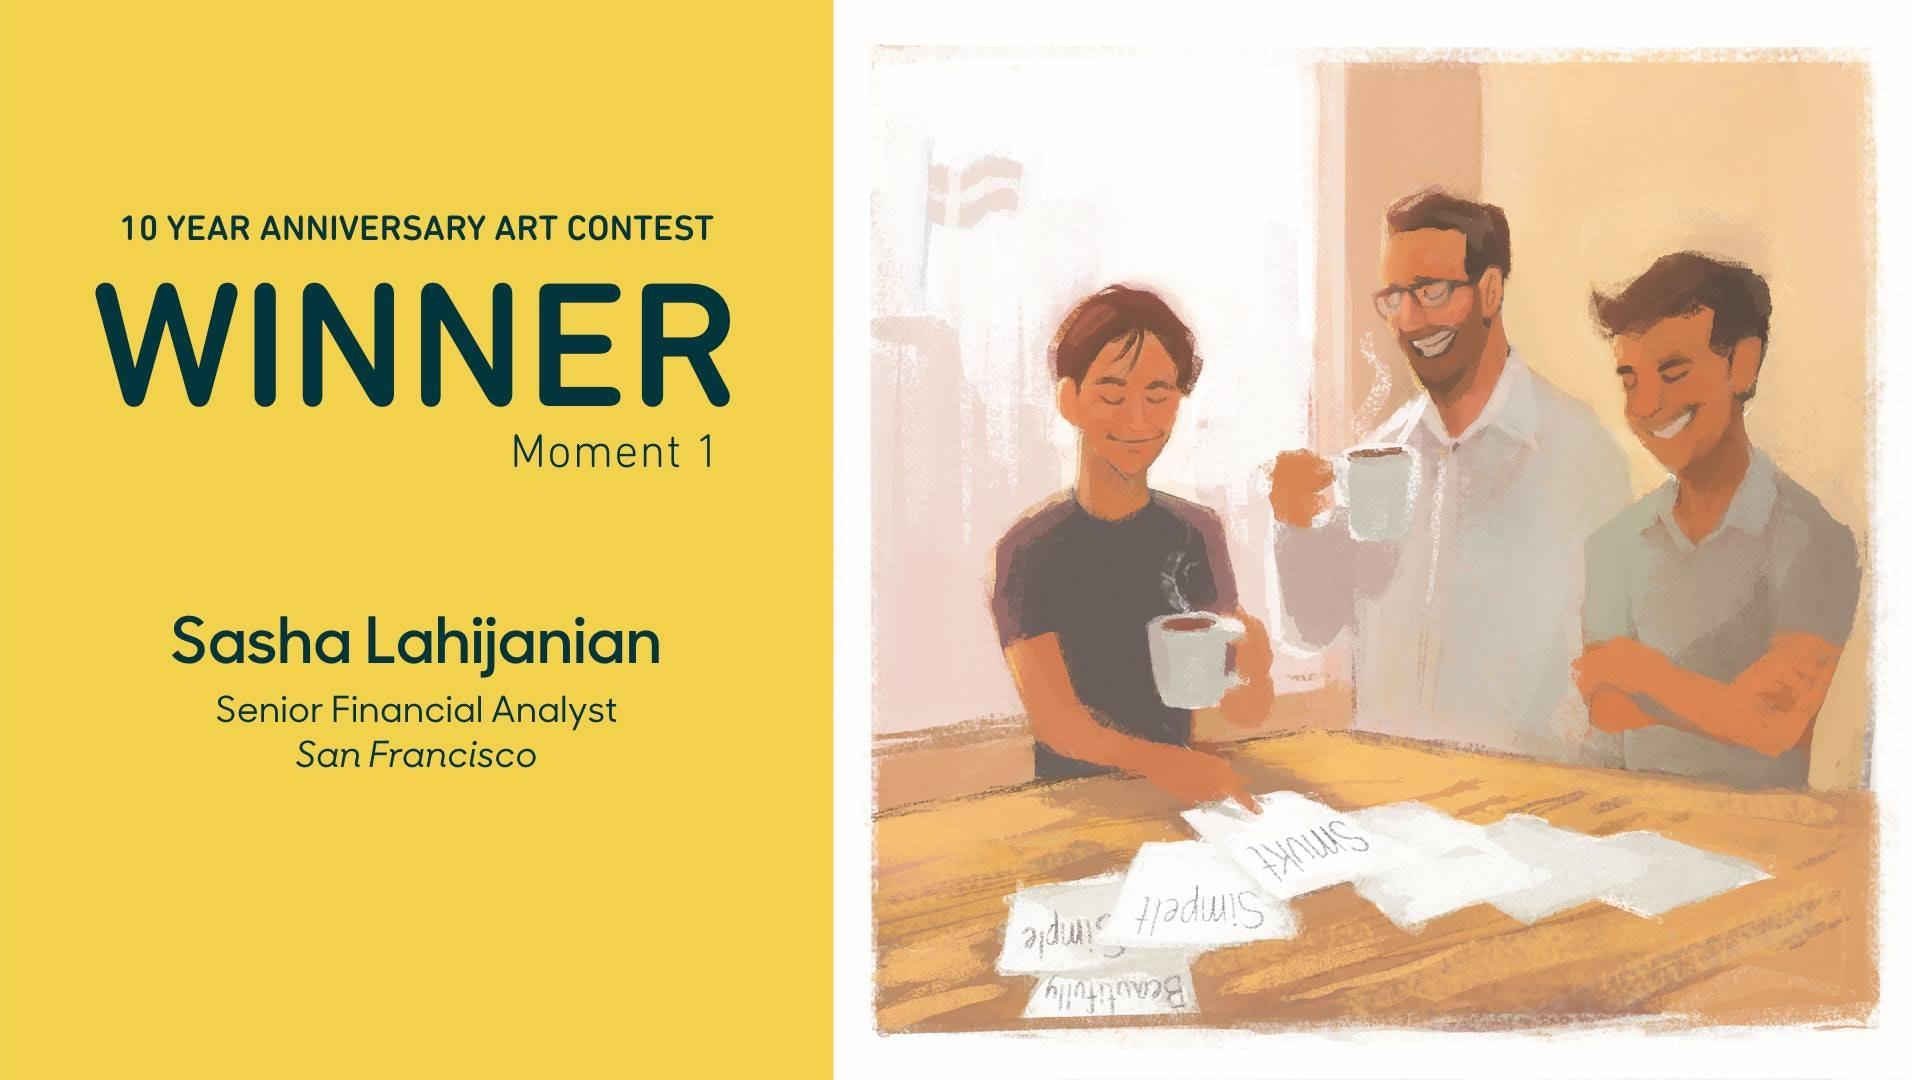 10 year anniversary art contest winning entry by Sasha Lahijanian